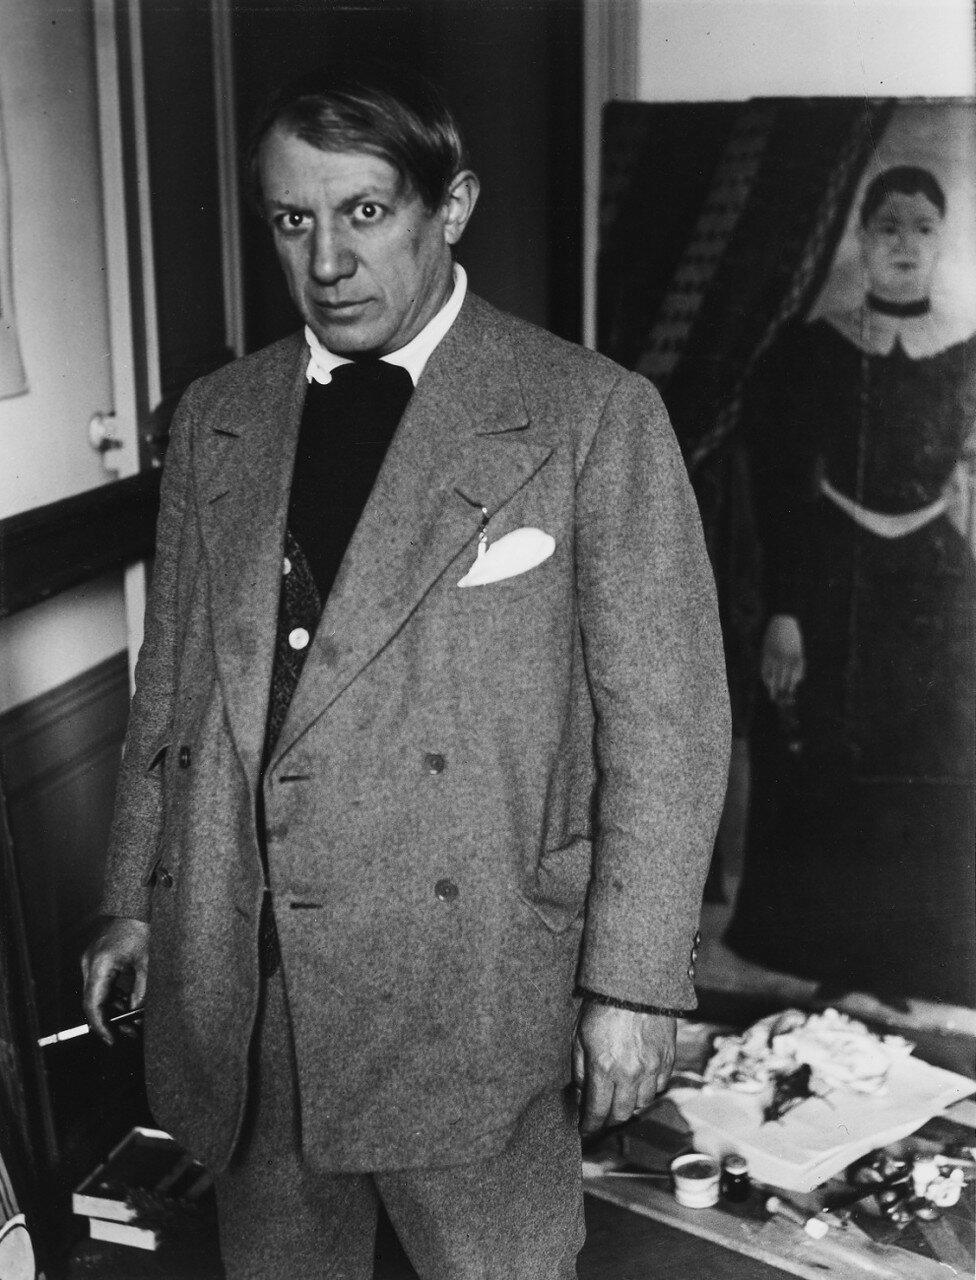 1932. Пикассо на фоне портрета «Ядвига» Руссо в мастерской на улице Боэси